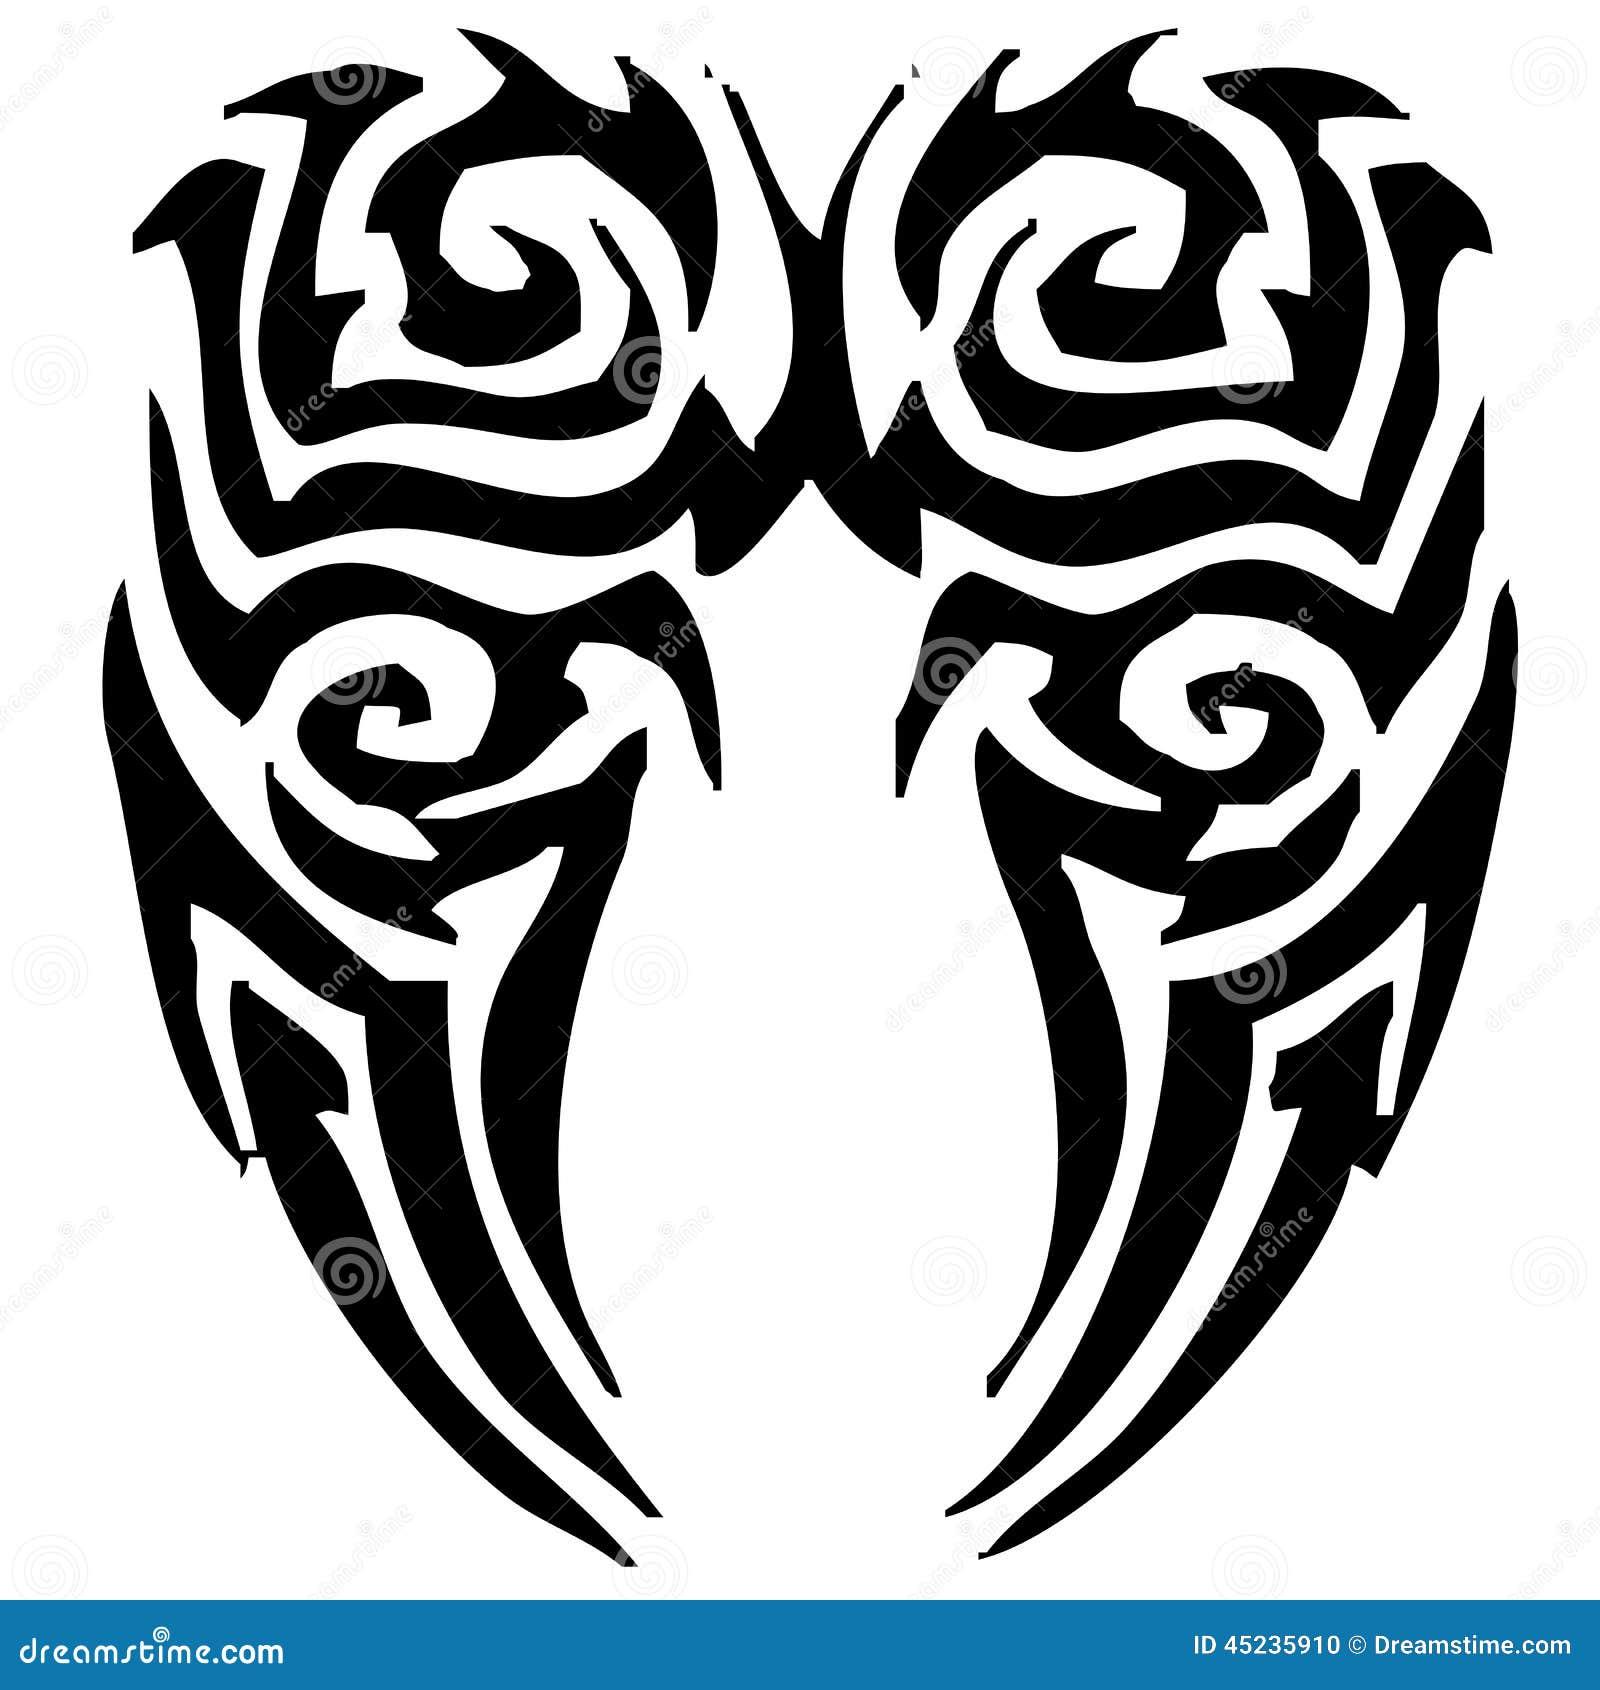 angel wings tattoo tribal illustration stock image 45235910. Black Bedroom Furniture Sets. Home Design Ideas